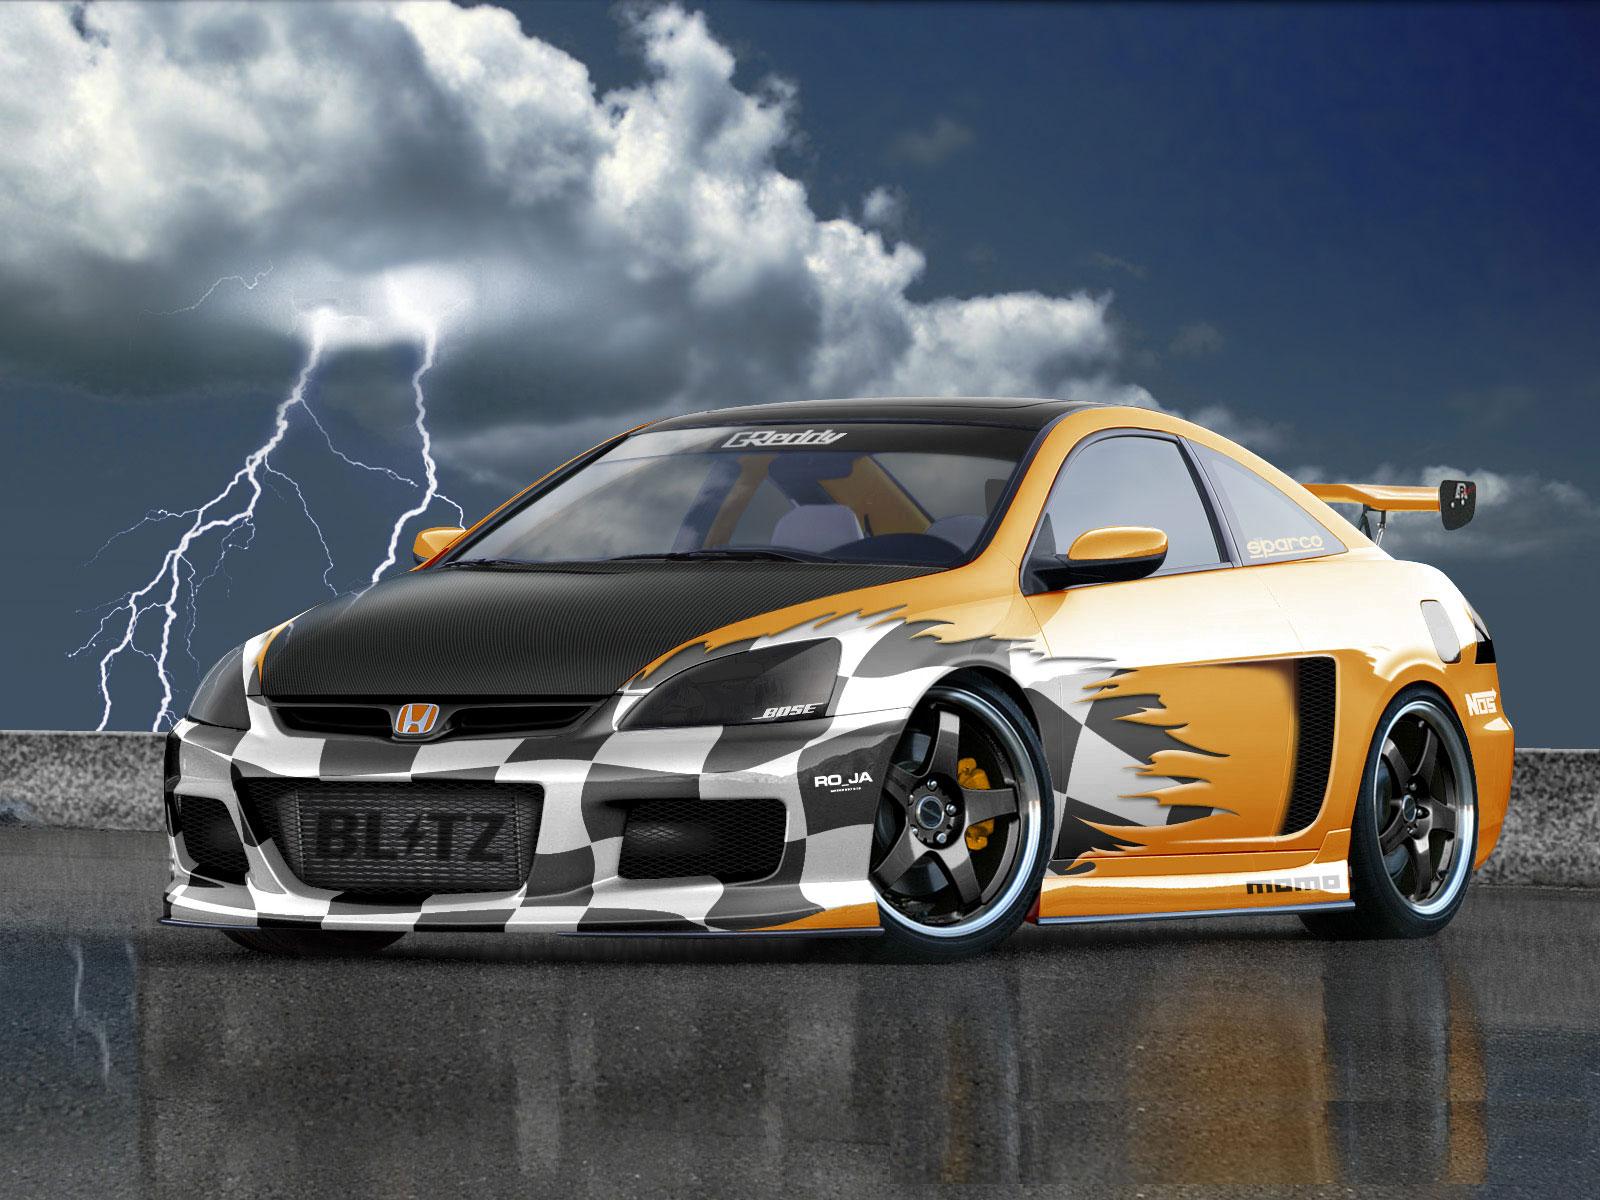 cool_fast_cars_wallpapers%2B4.jpg